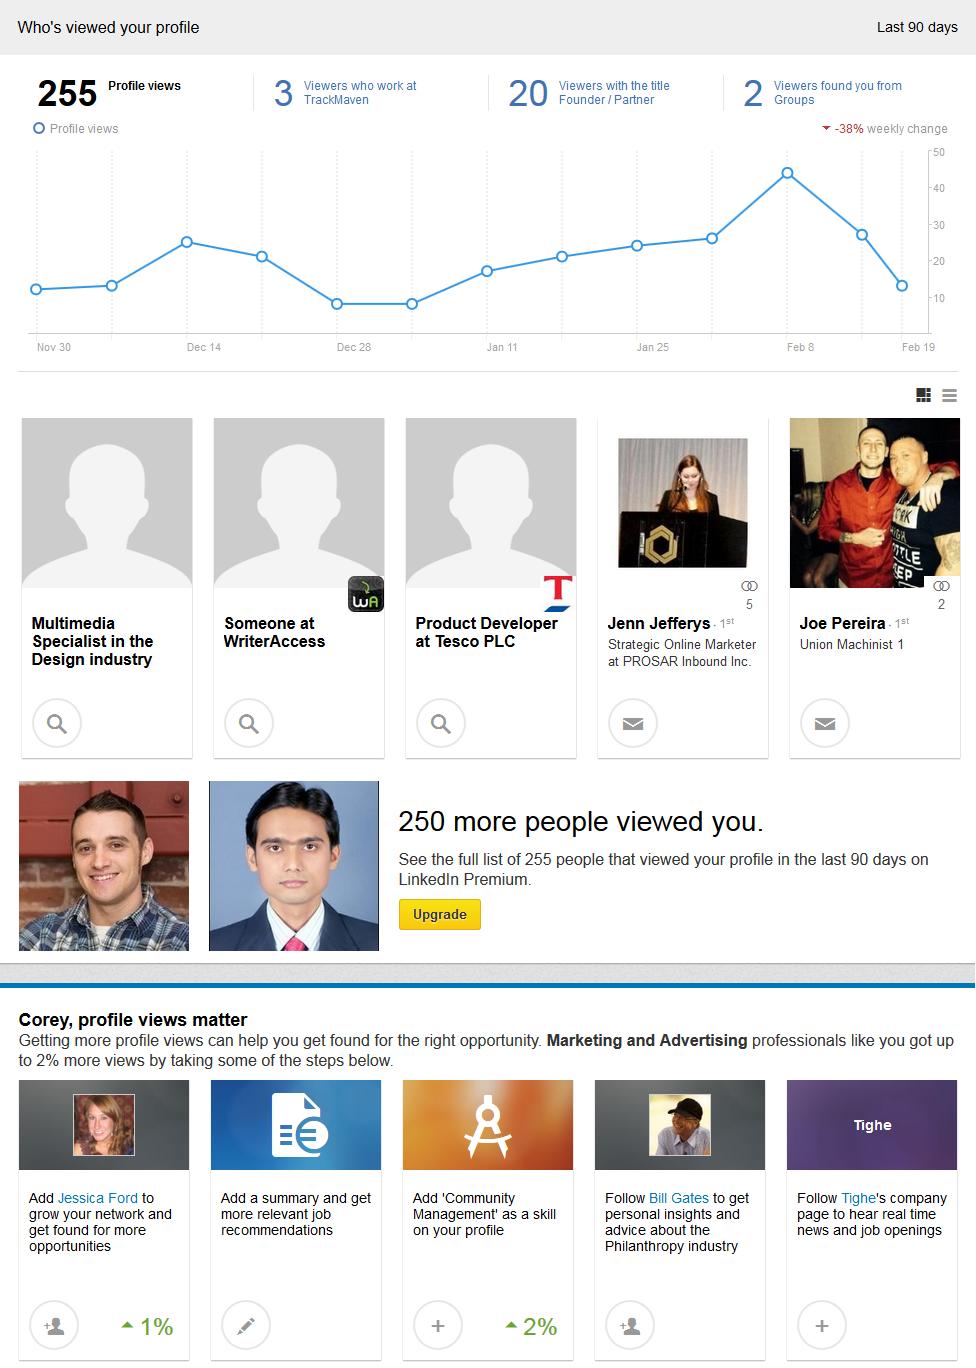 Good News for Creepers: LinkedIn Upgrades